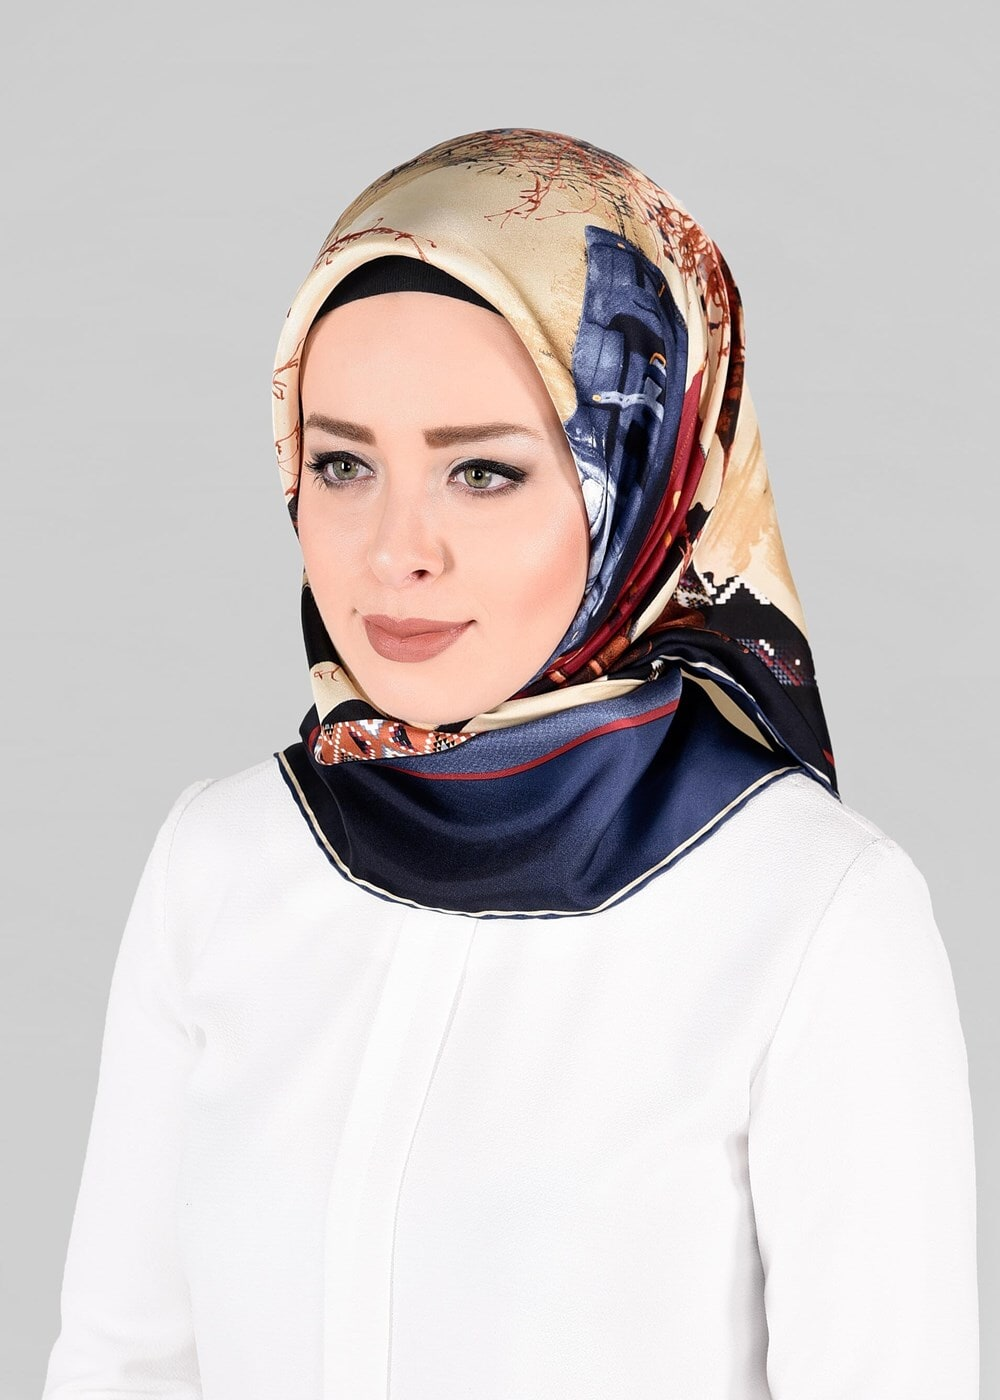 Bayan LACİVERT T 13286-1 ALVİNA İPEK EŞARP